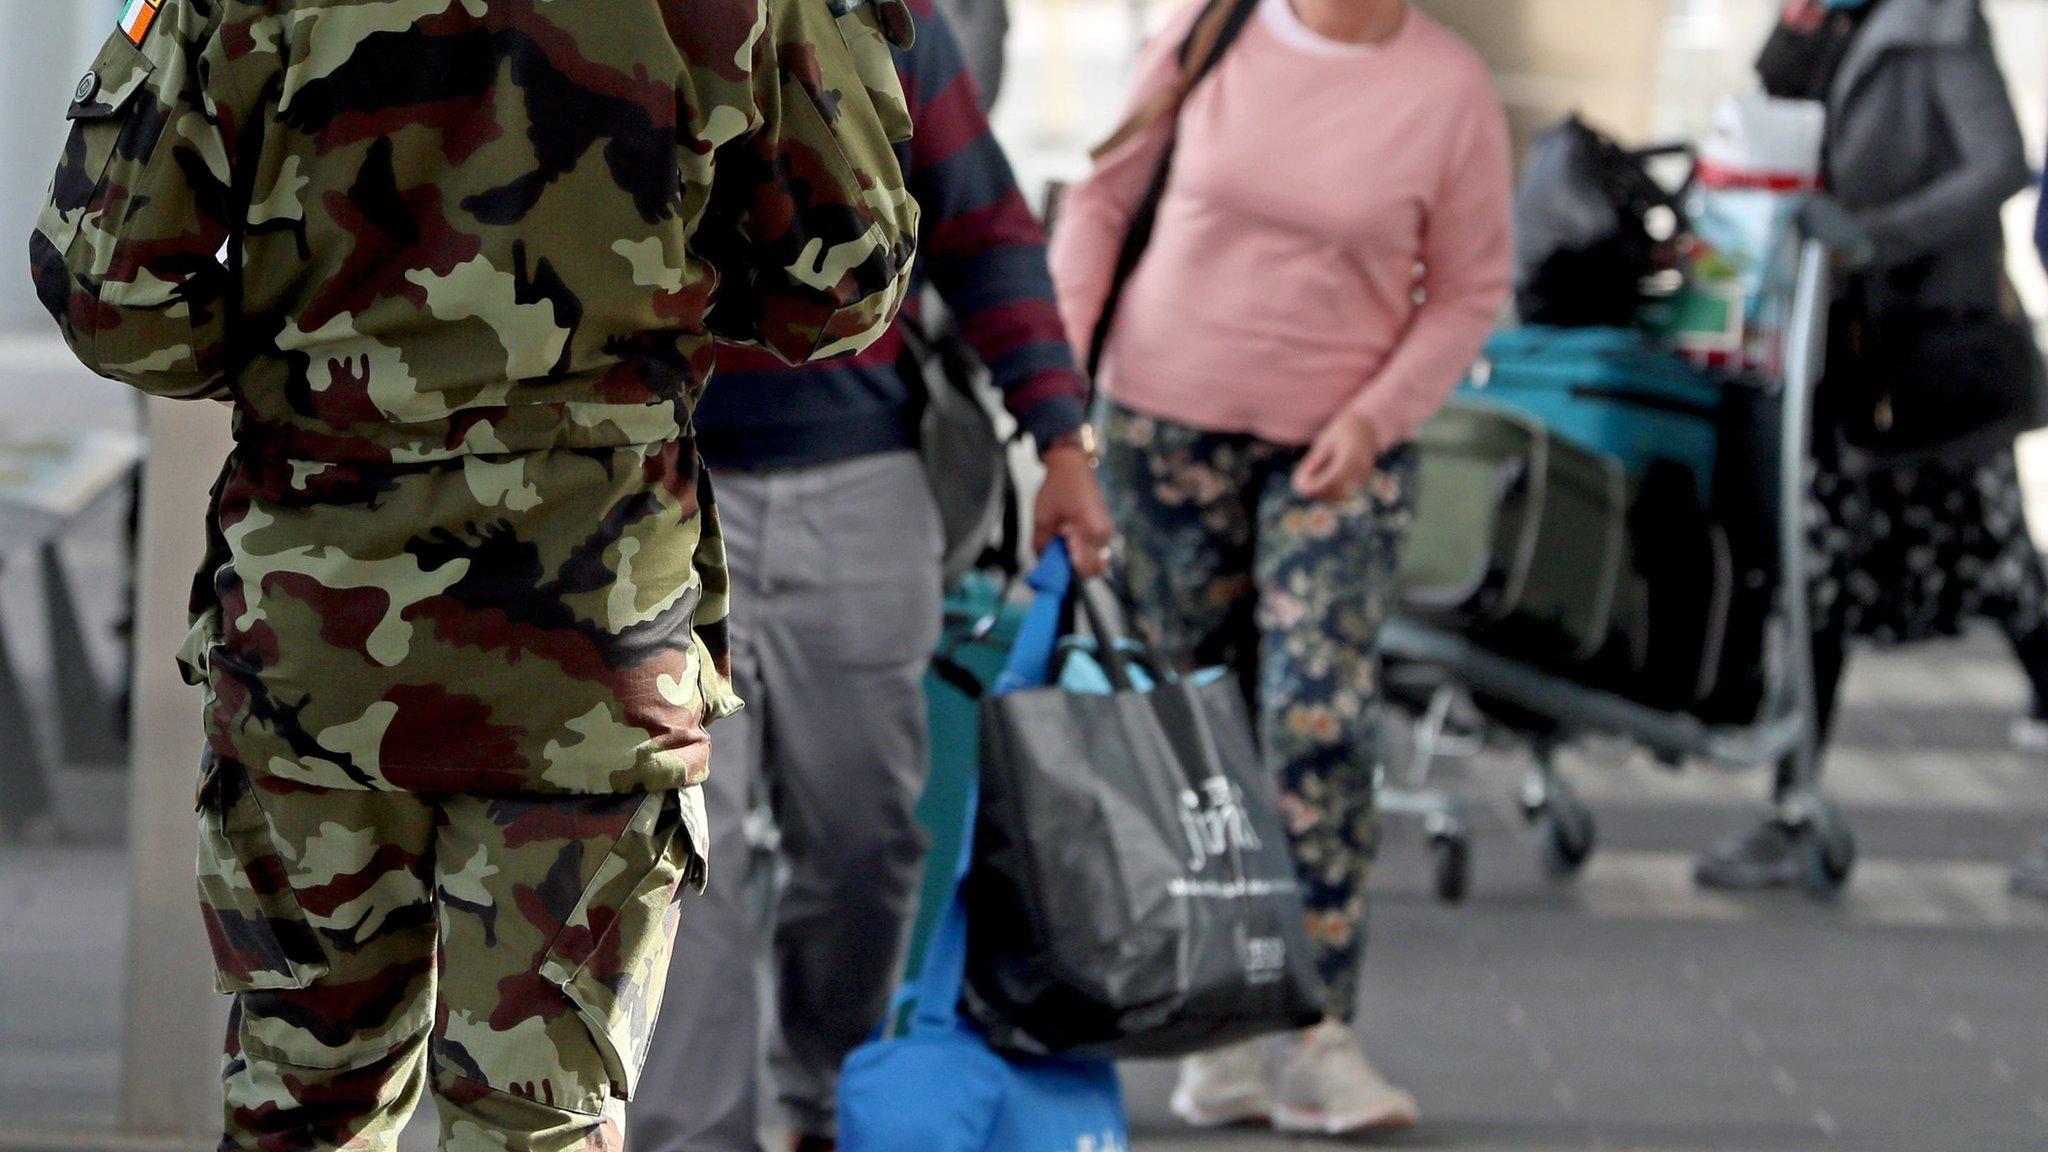 Covid 19 Dublin Women Charged For Refusing Hotel Quarantine Bbc News